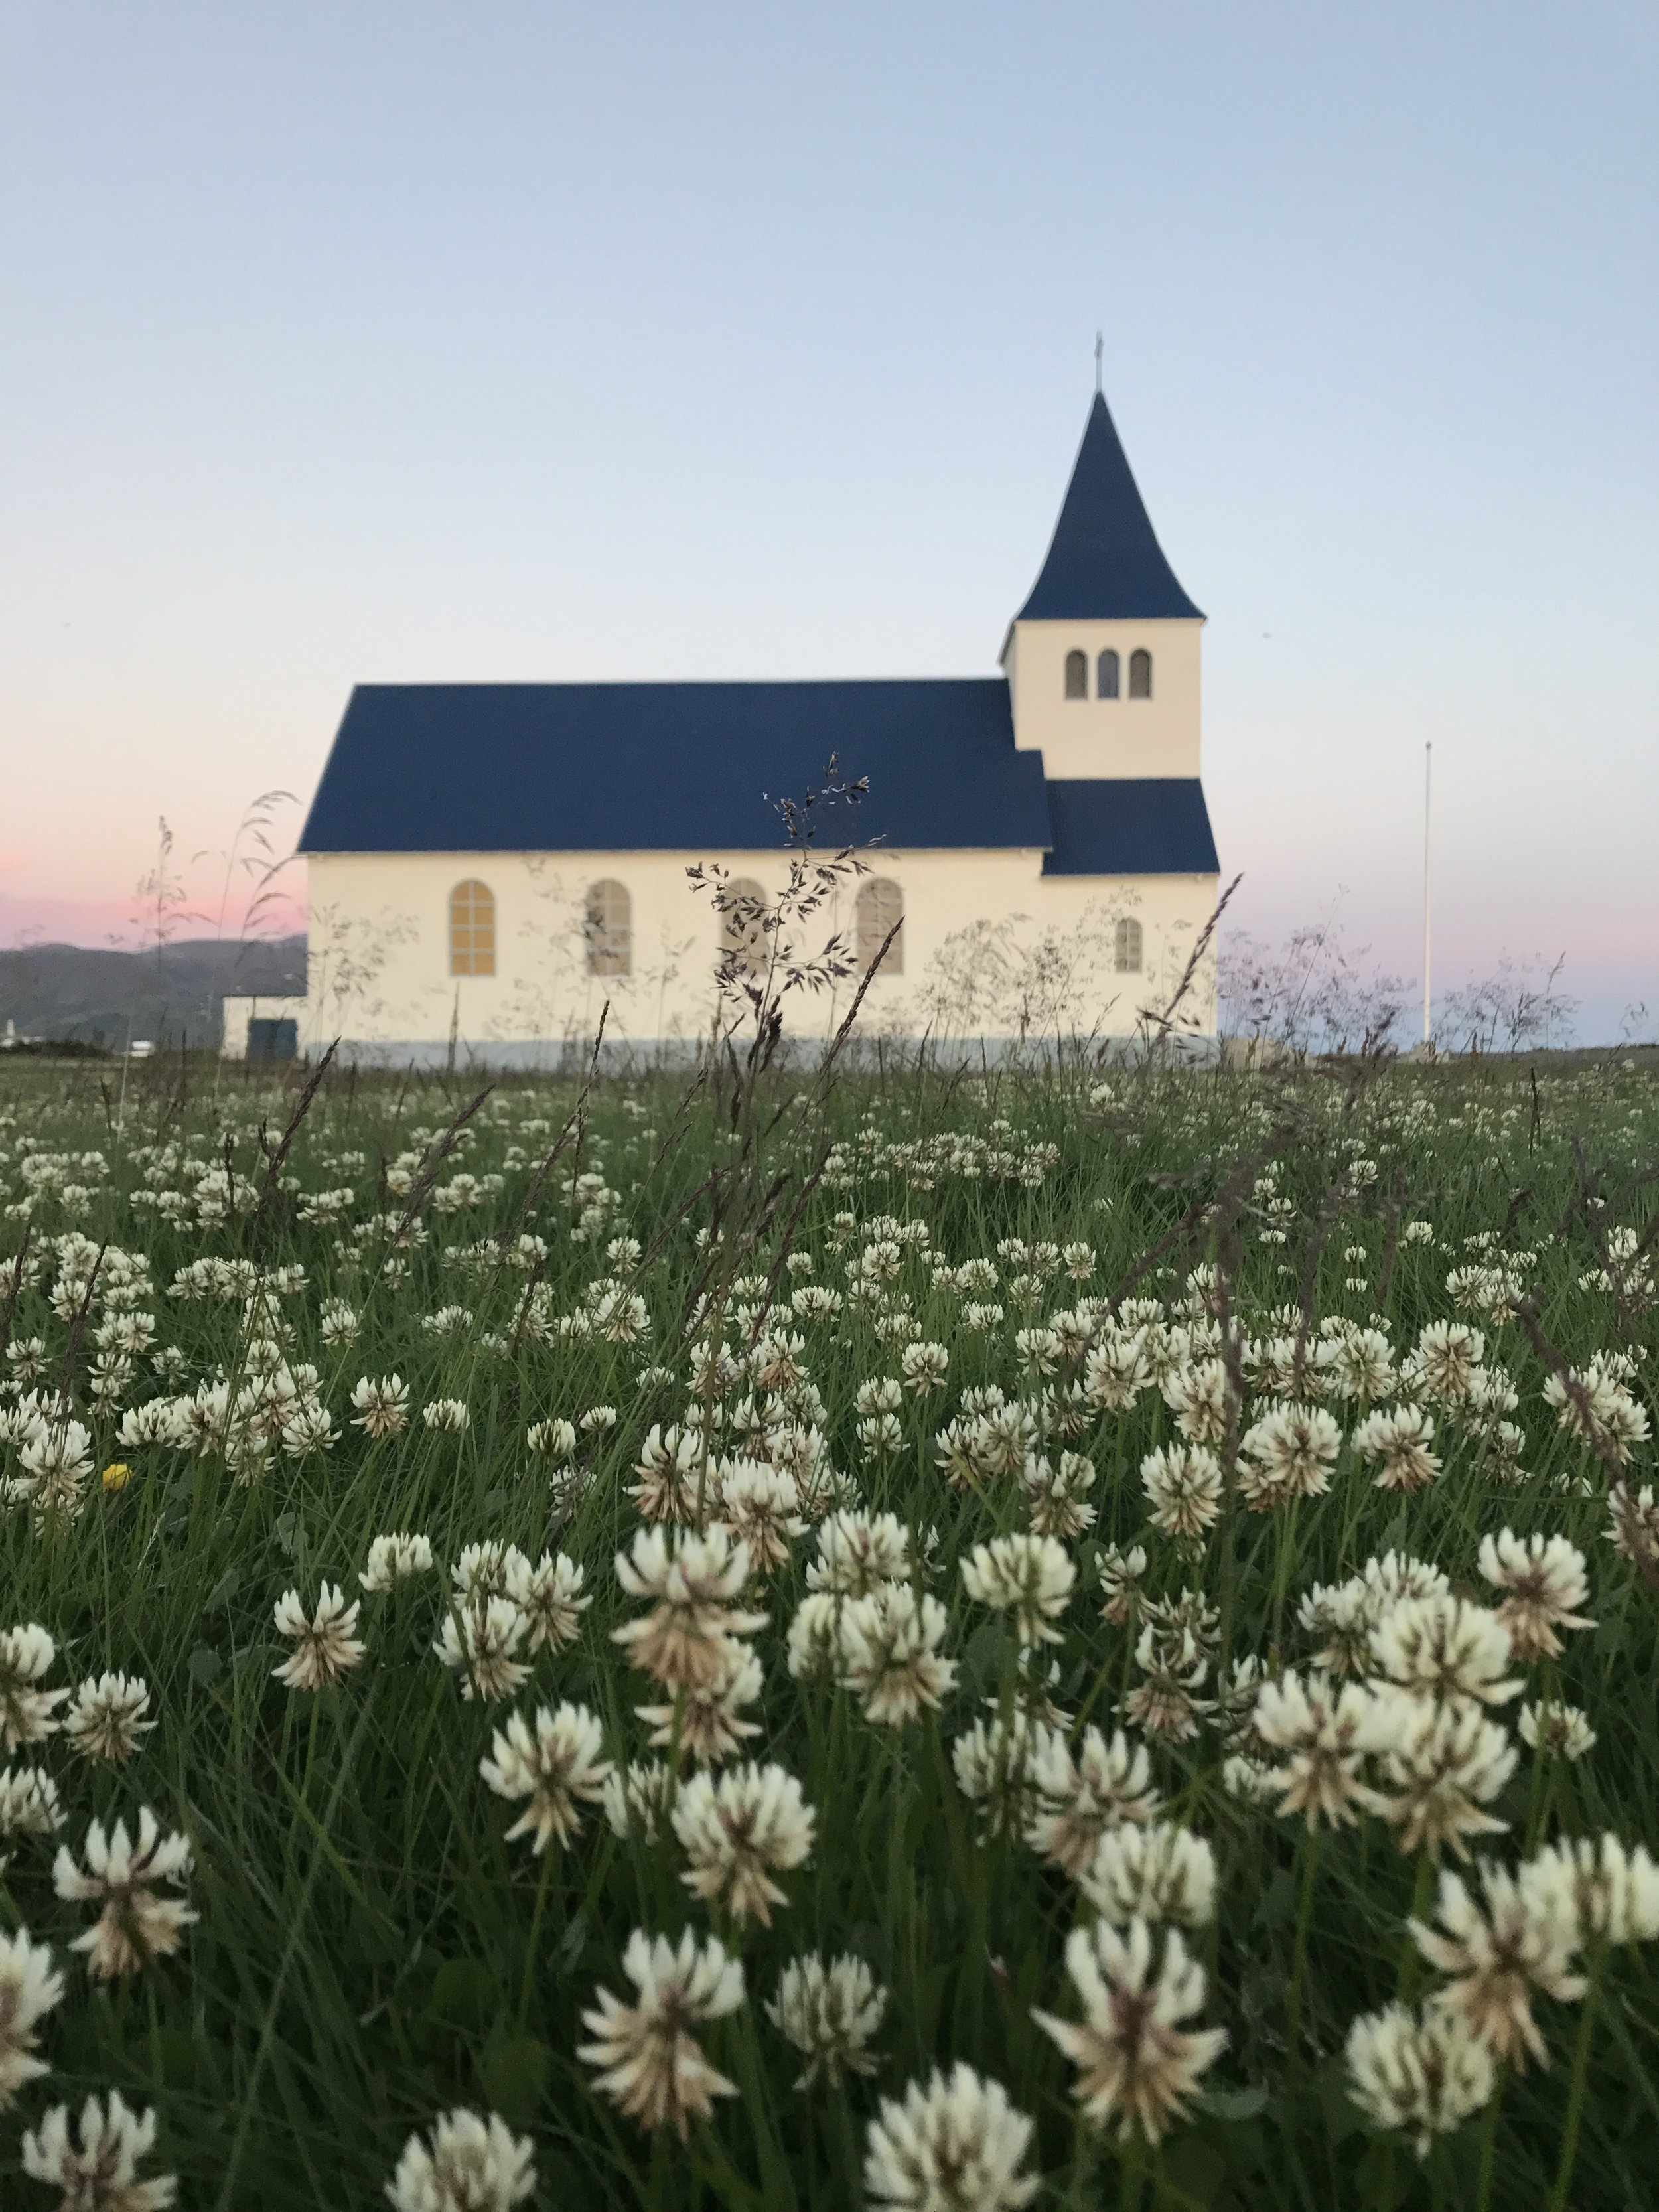 A view of a little Icelandic church through the clover